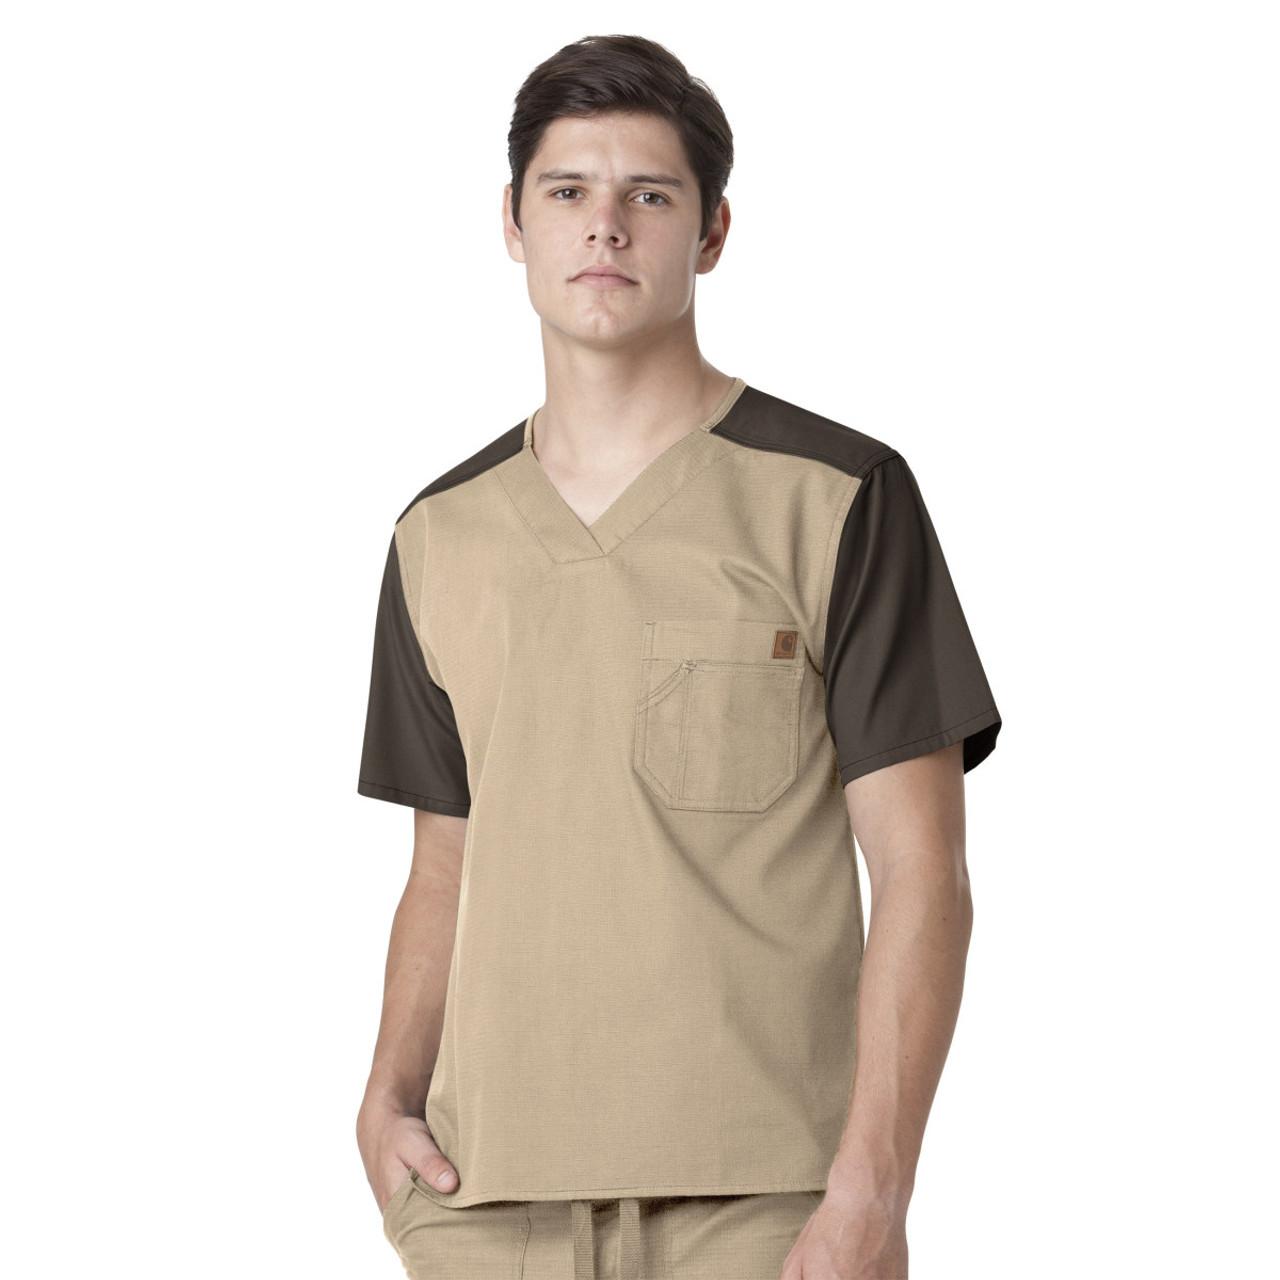 (C14108) Carhartt Ripstop Men's Contrast V-neck Utility Scrub Top